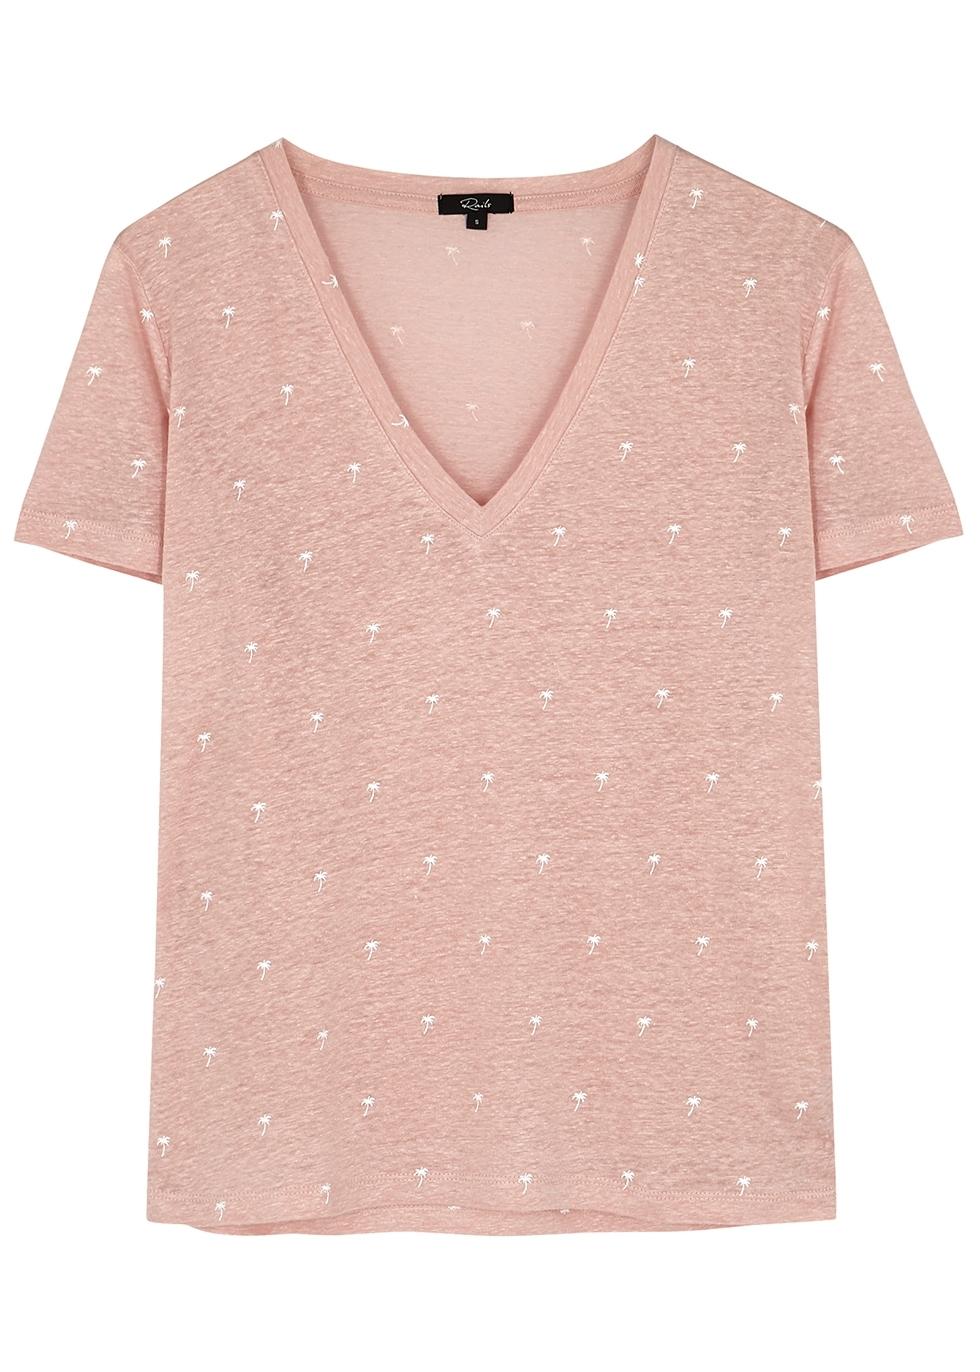 777177ed Women's Designer T-Shirts - Cotton, Linen & Striped - Harvey Nichols